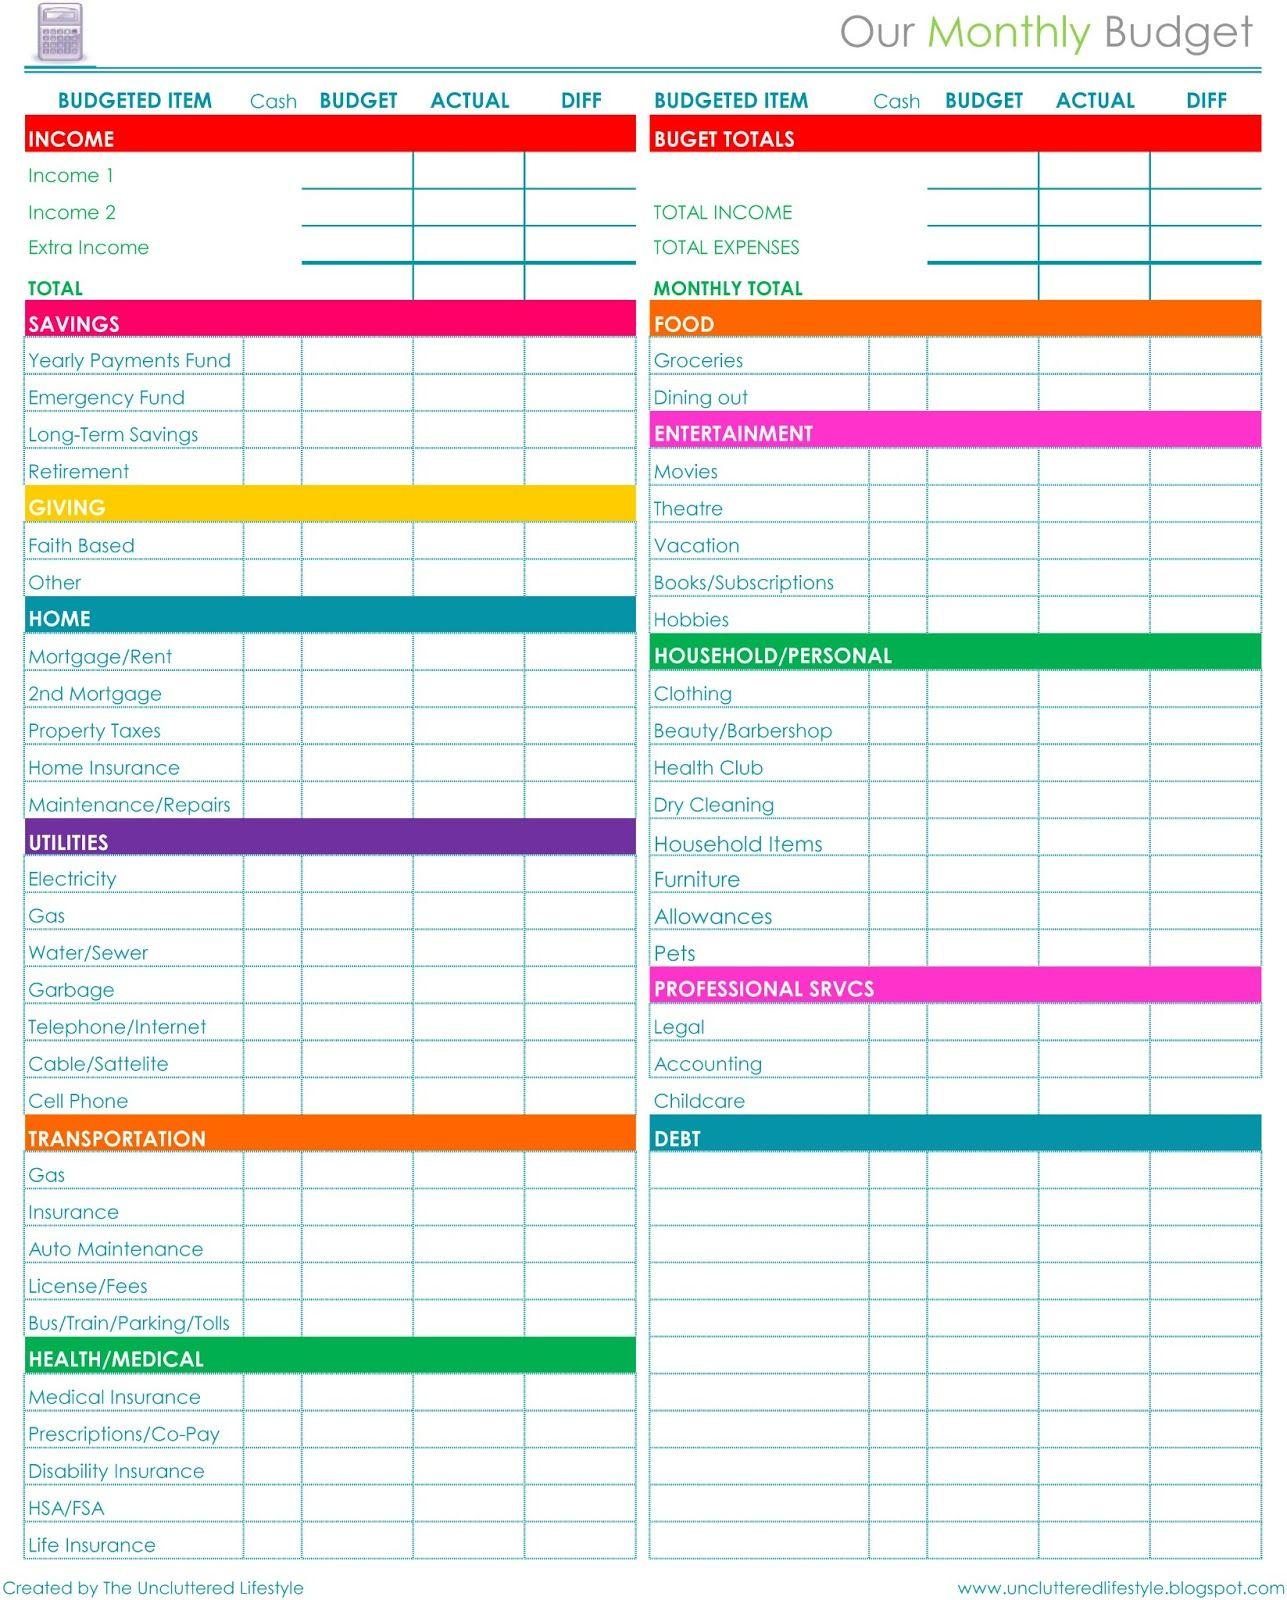 Pinprintables Kathy Loves <3 On Binders~Home Organization | Free Printable Home Organization Worksheets